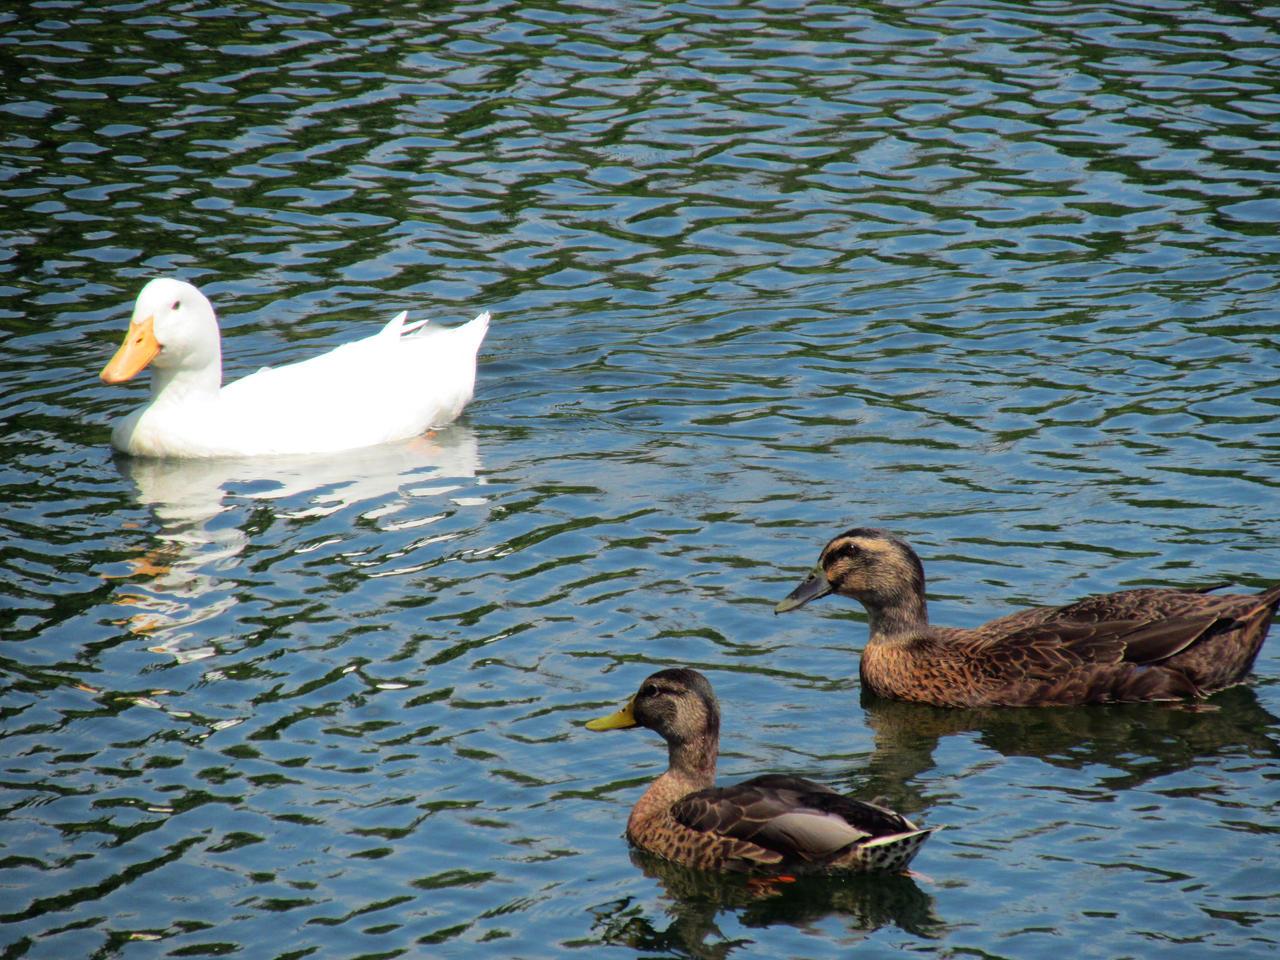 Group Of Ducks By Teleman8 On Deviantart